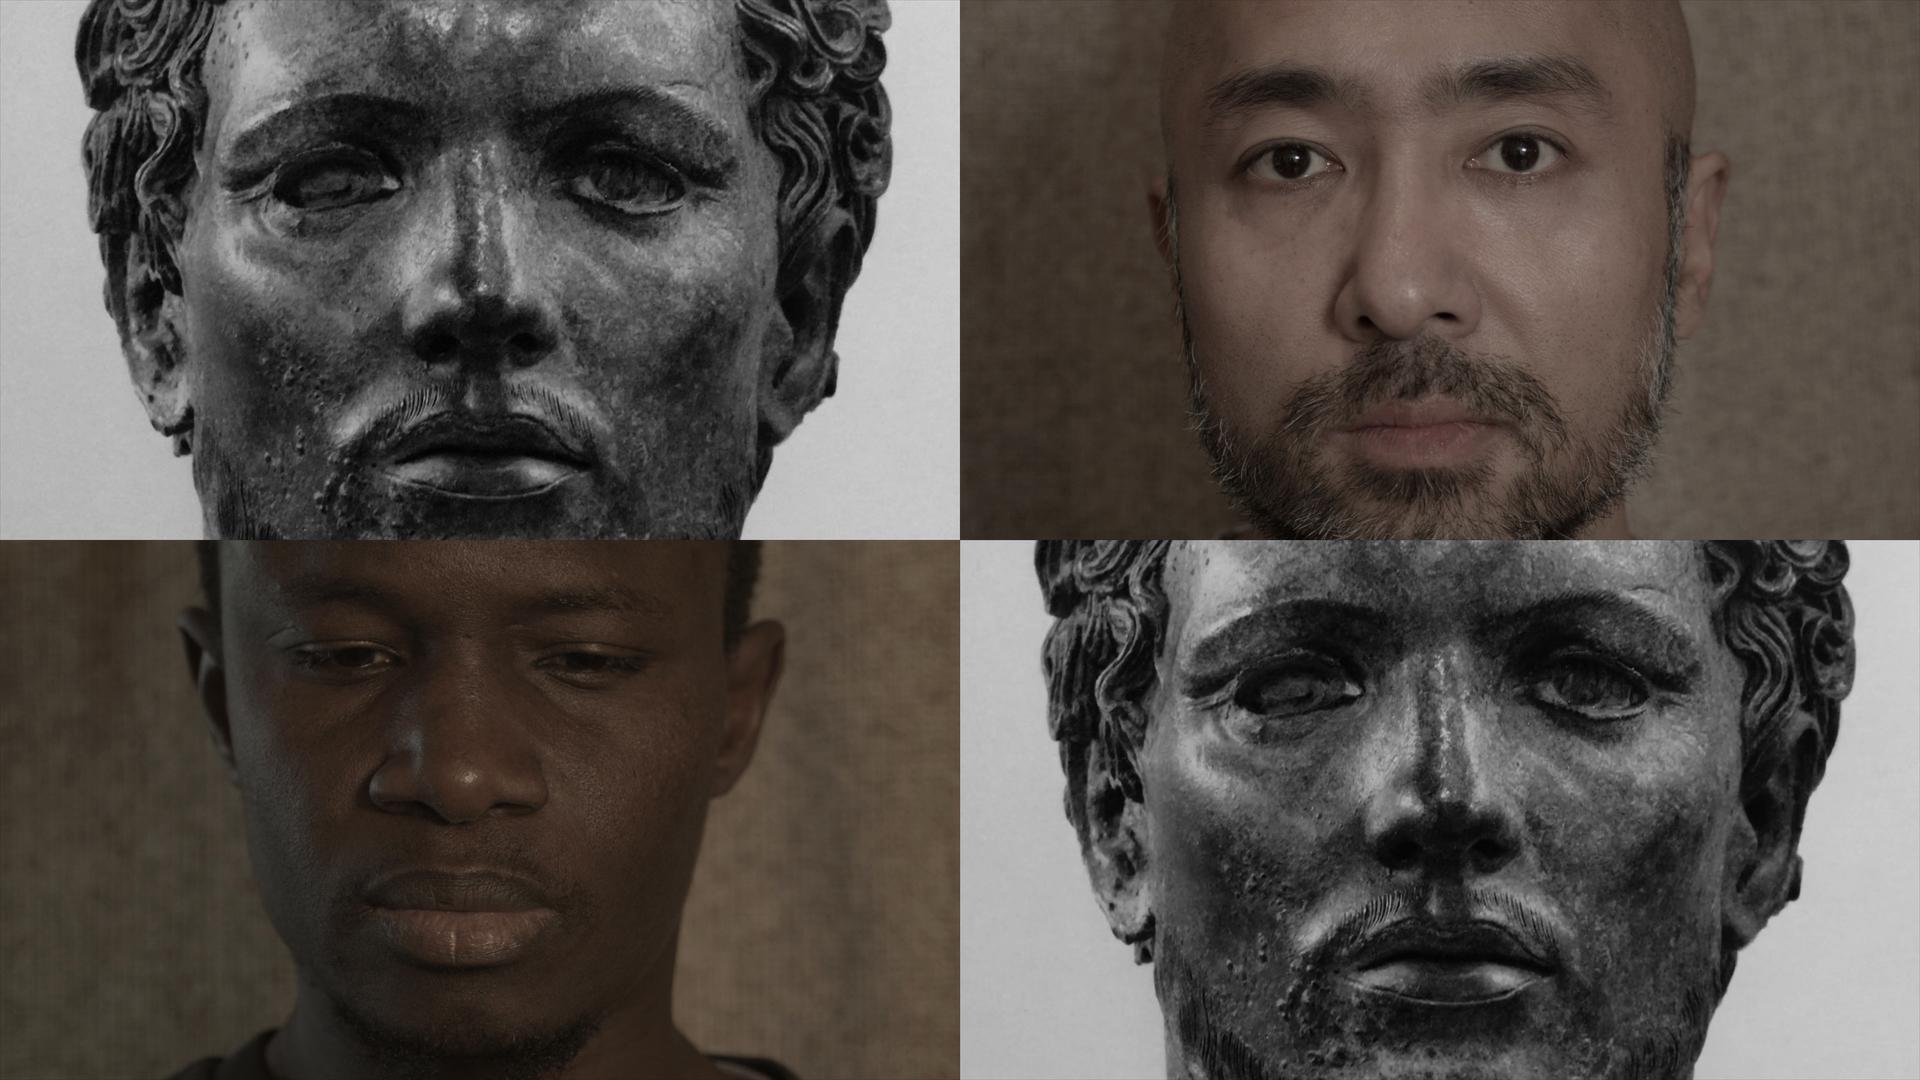 Ulises inmigrante  (fotograma) x Eduardo Stupía, 2018.